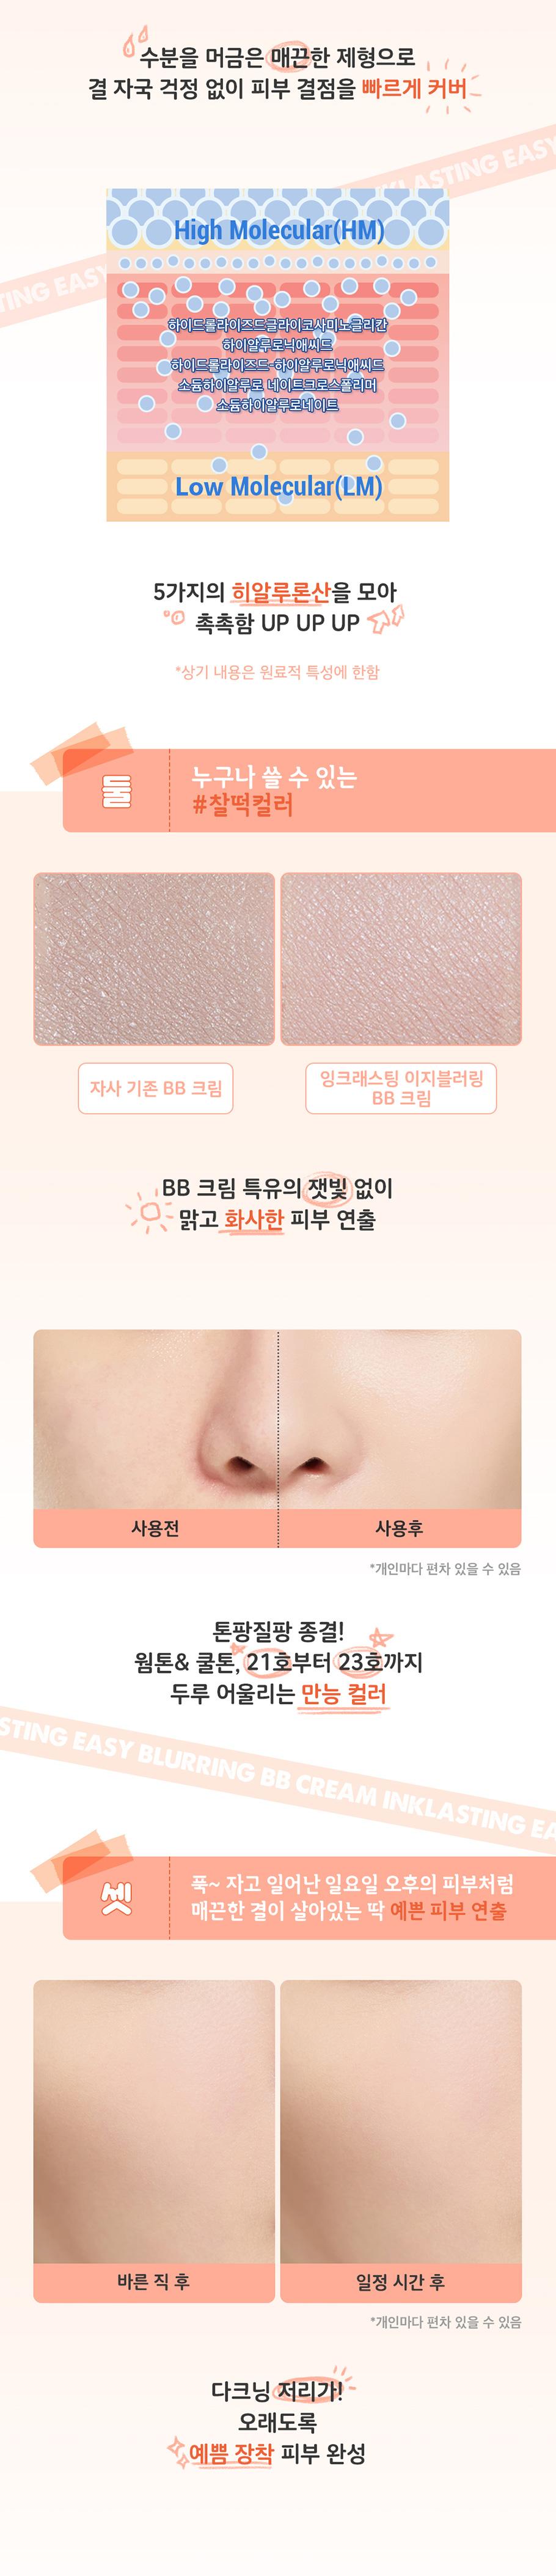 [ShiPAPA] Peripera | InkLasting Easy Blurring BB Cream| 韓國直送🇰🇷 | 香港 澳門